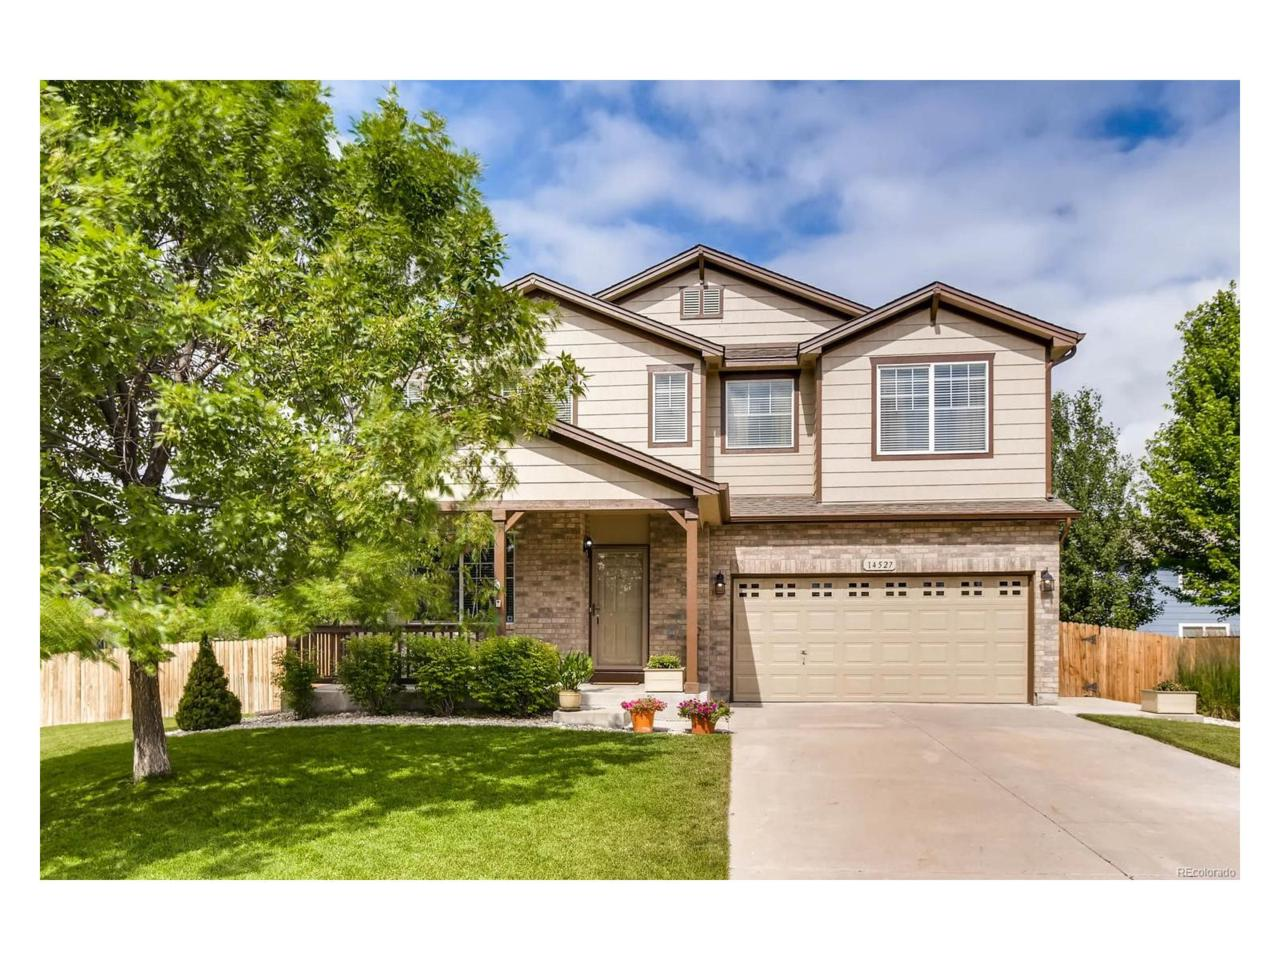 14527 Vine Street, Thornton, CO 80602 (MLS #7640442) :: 8z Real Estate